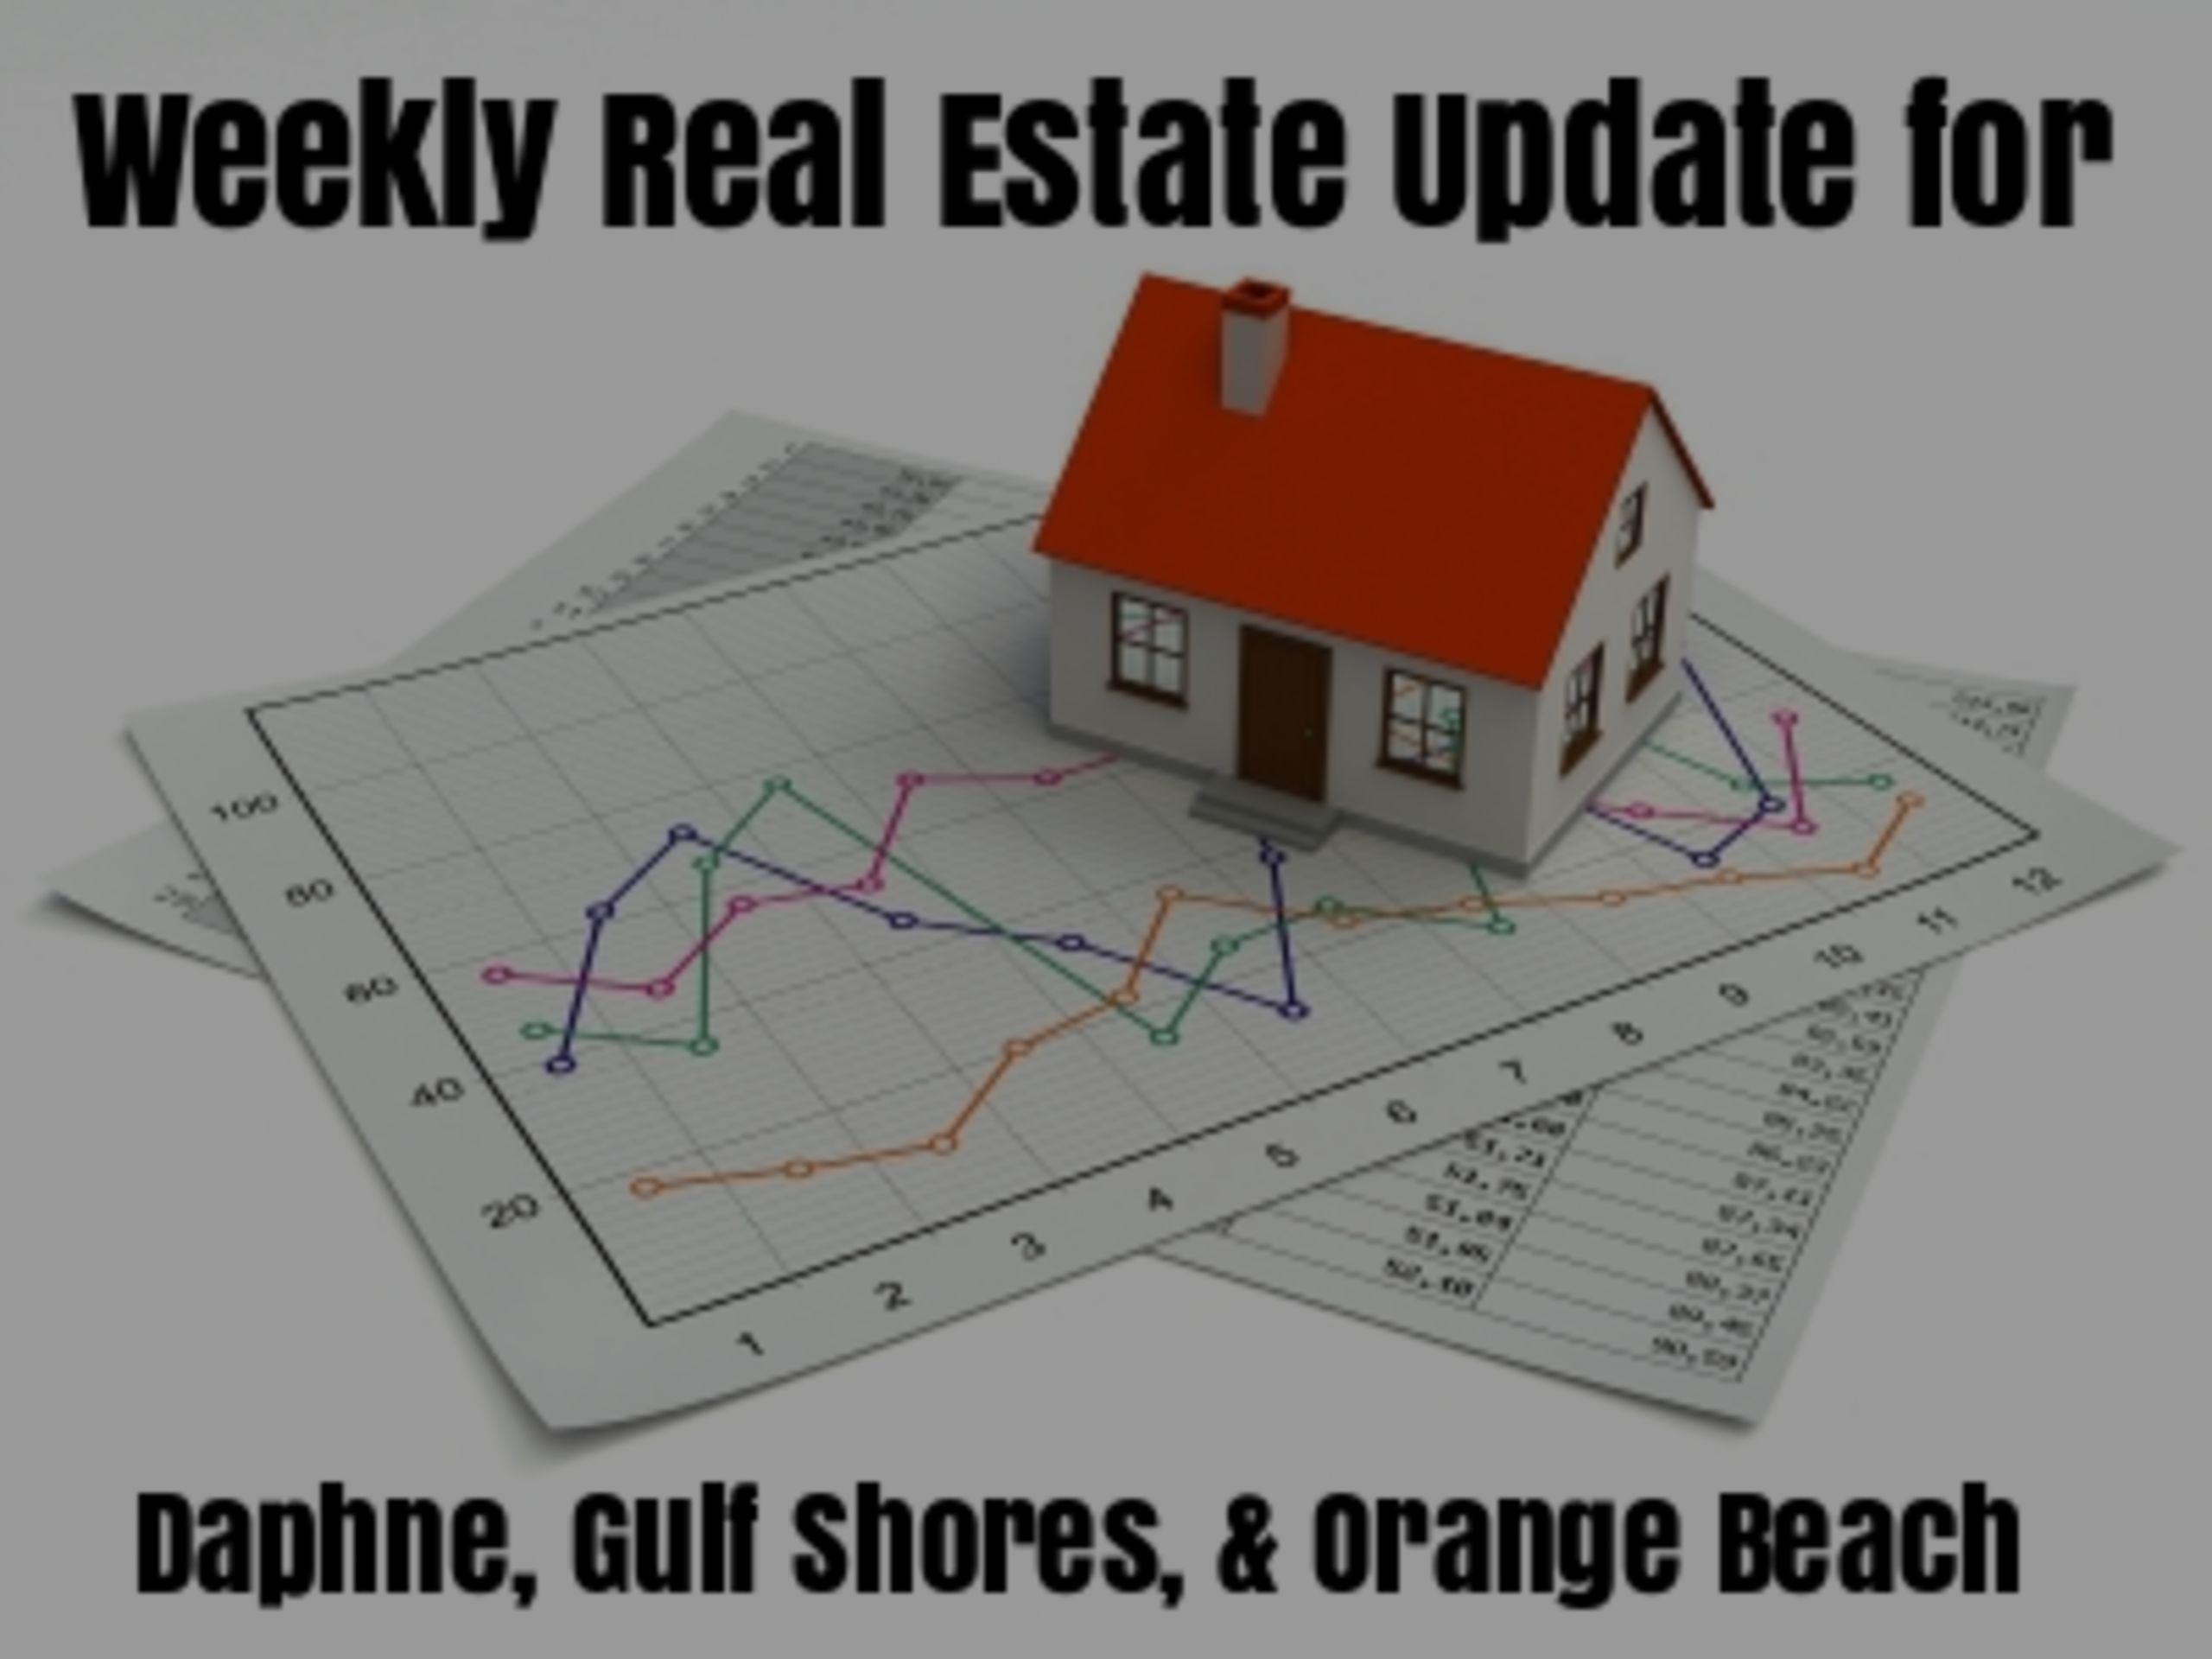 Weekly Real Estate Update – Daphne, Gulf Shores, and Orange Beach – 4/17/17